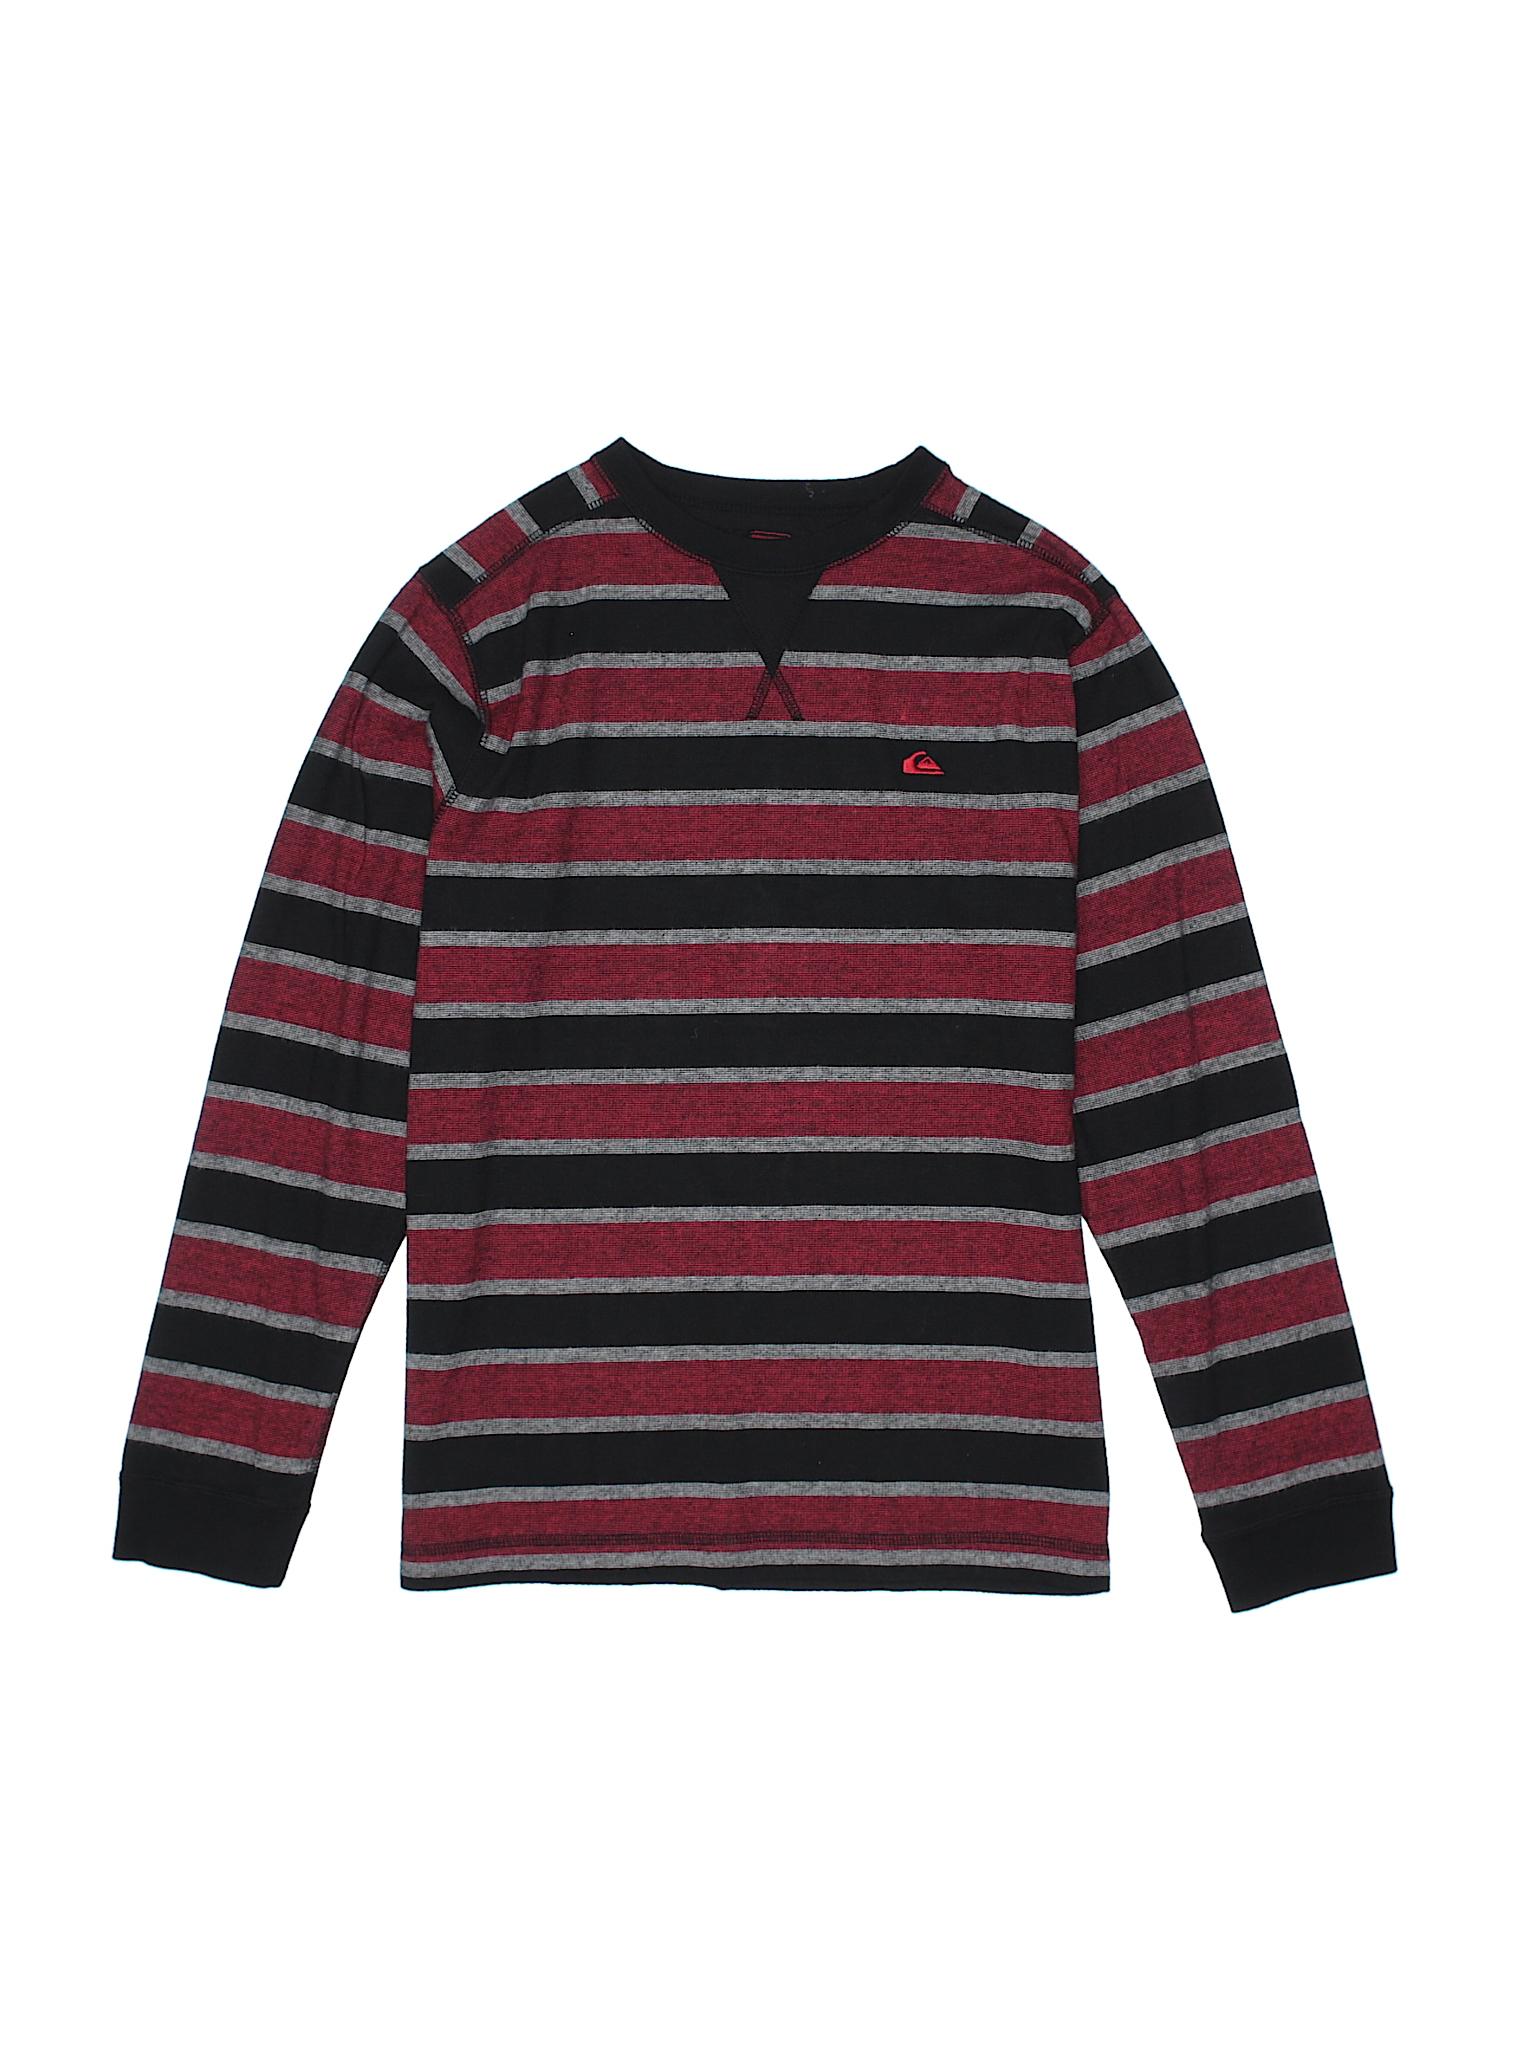 Quiksilver stripes burgundy long sleeve t shirt size x for Bureau quiksilver